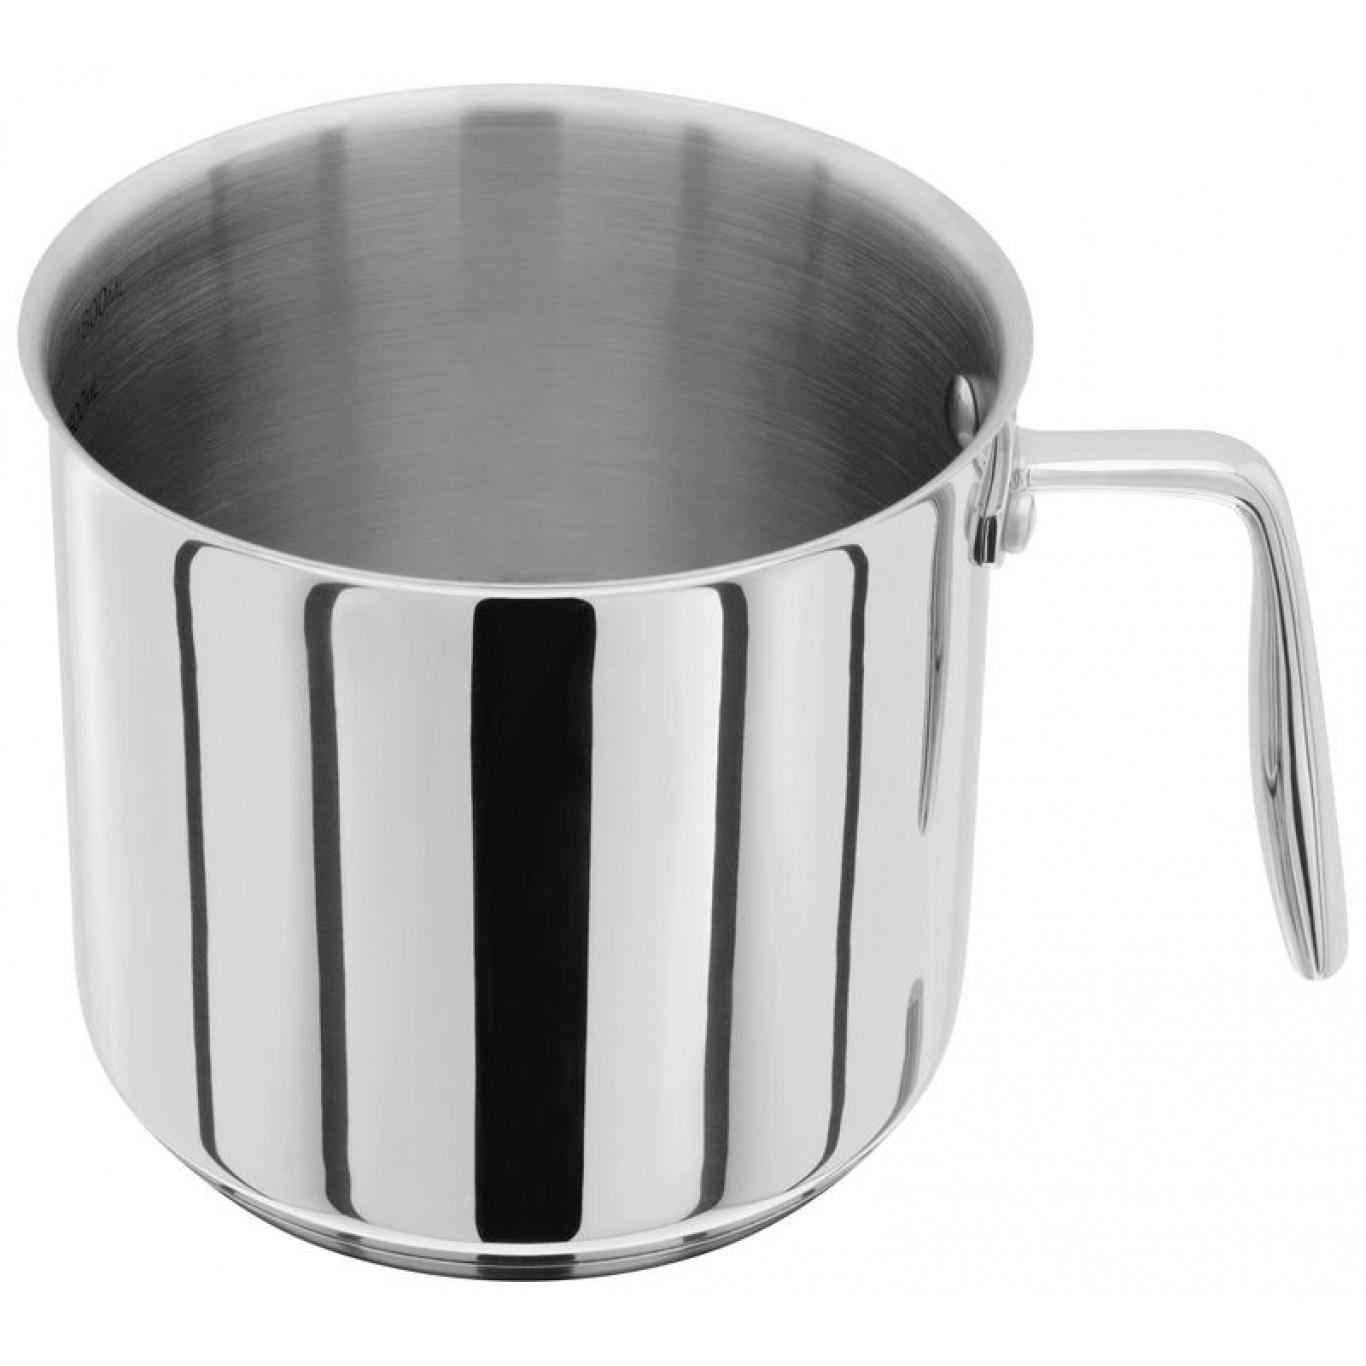 Stellar 7000 14cm Milk Sauce Pot